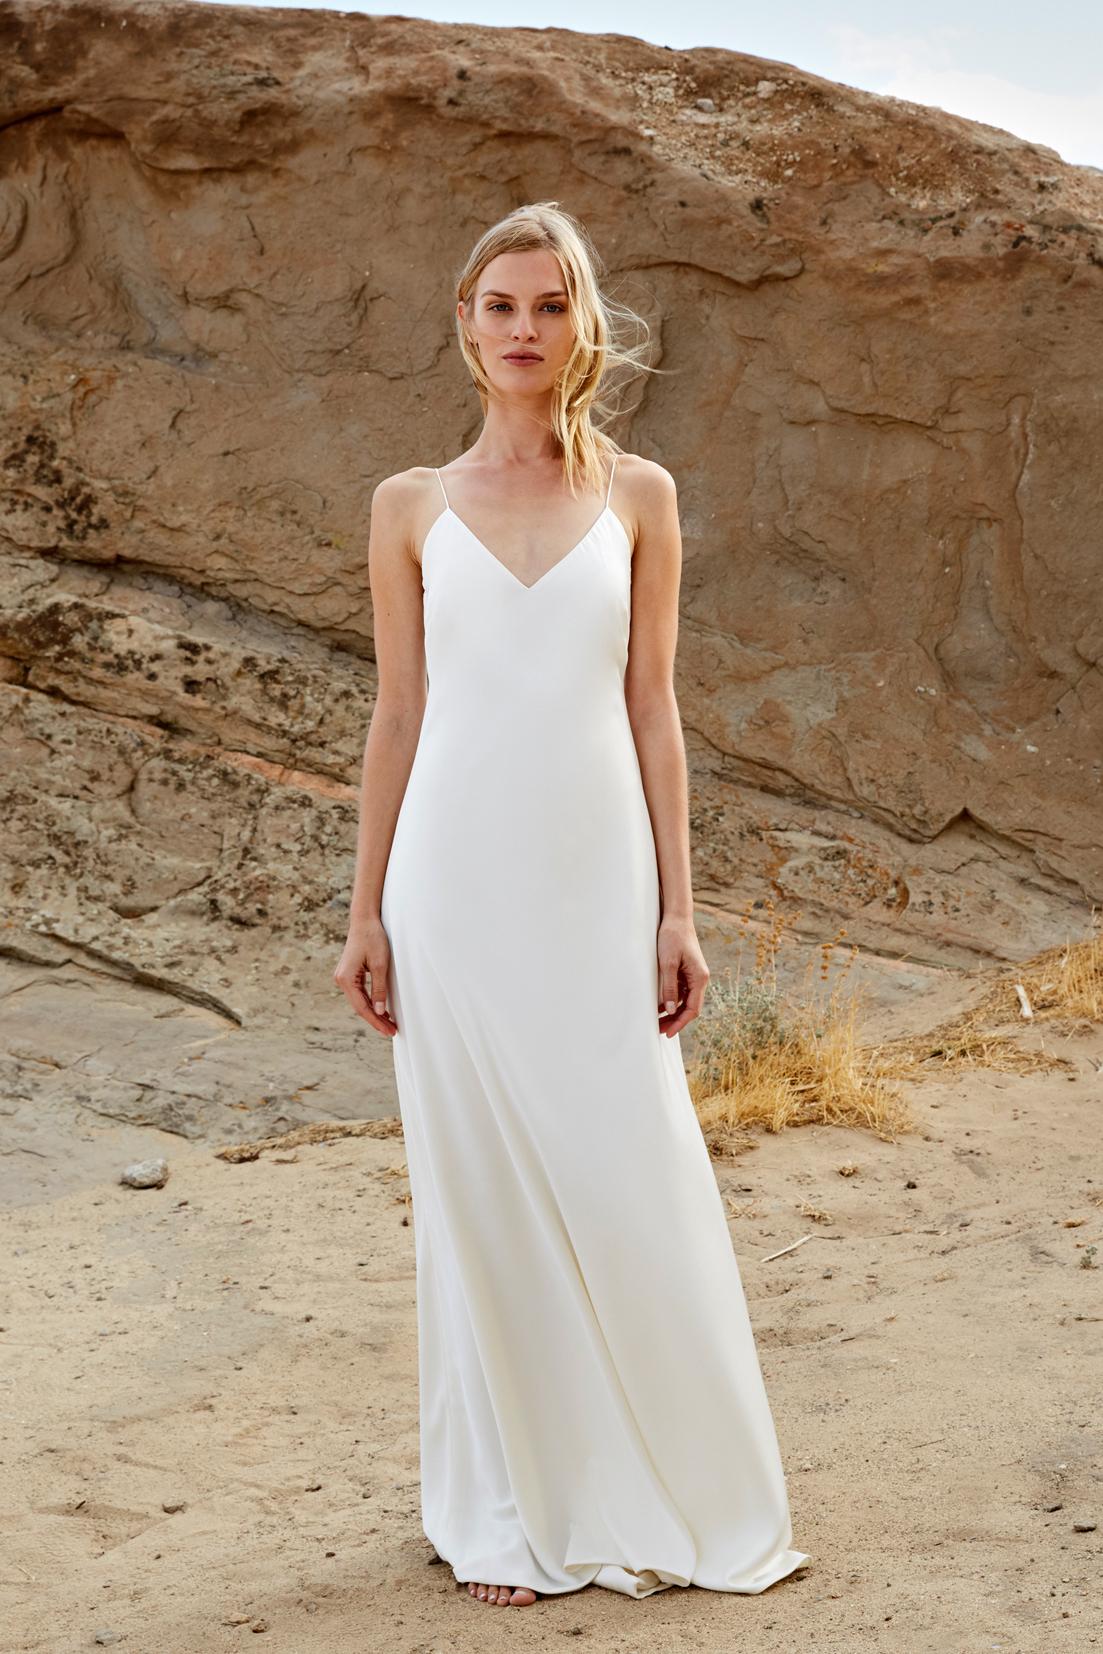 savannah miller fall 2018 v-neck spaghetti strap wedding dress